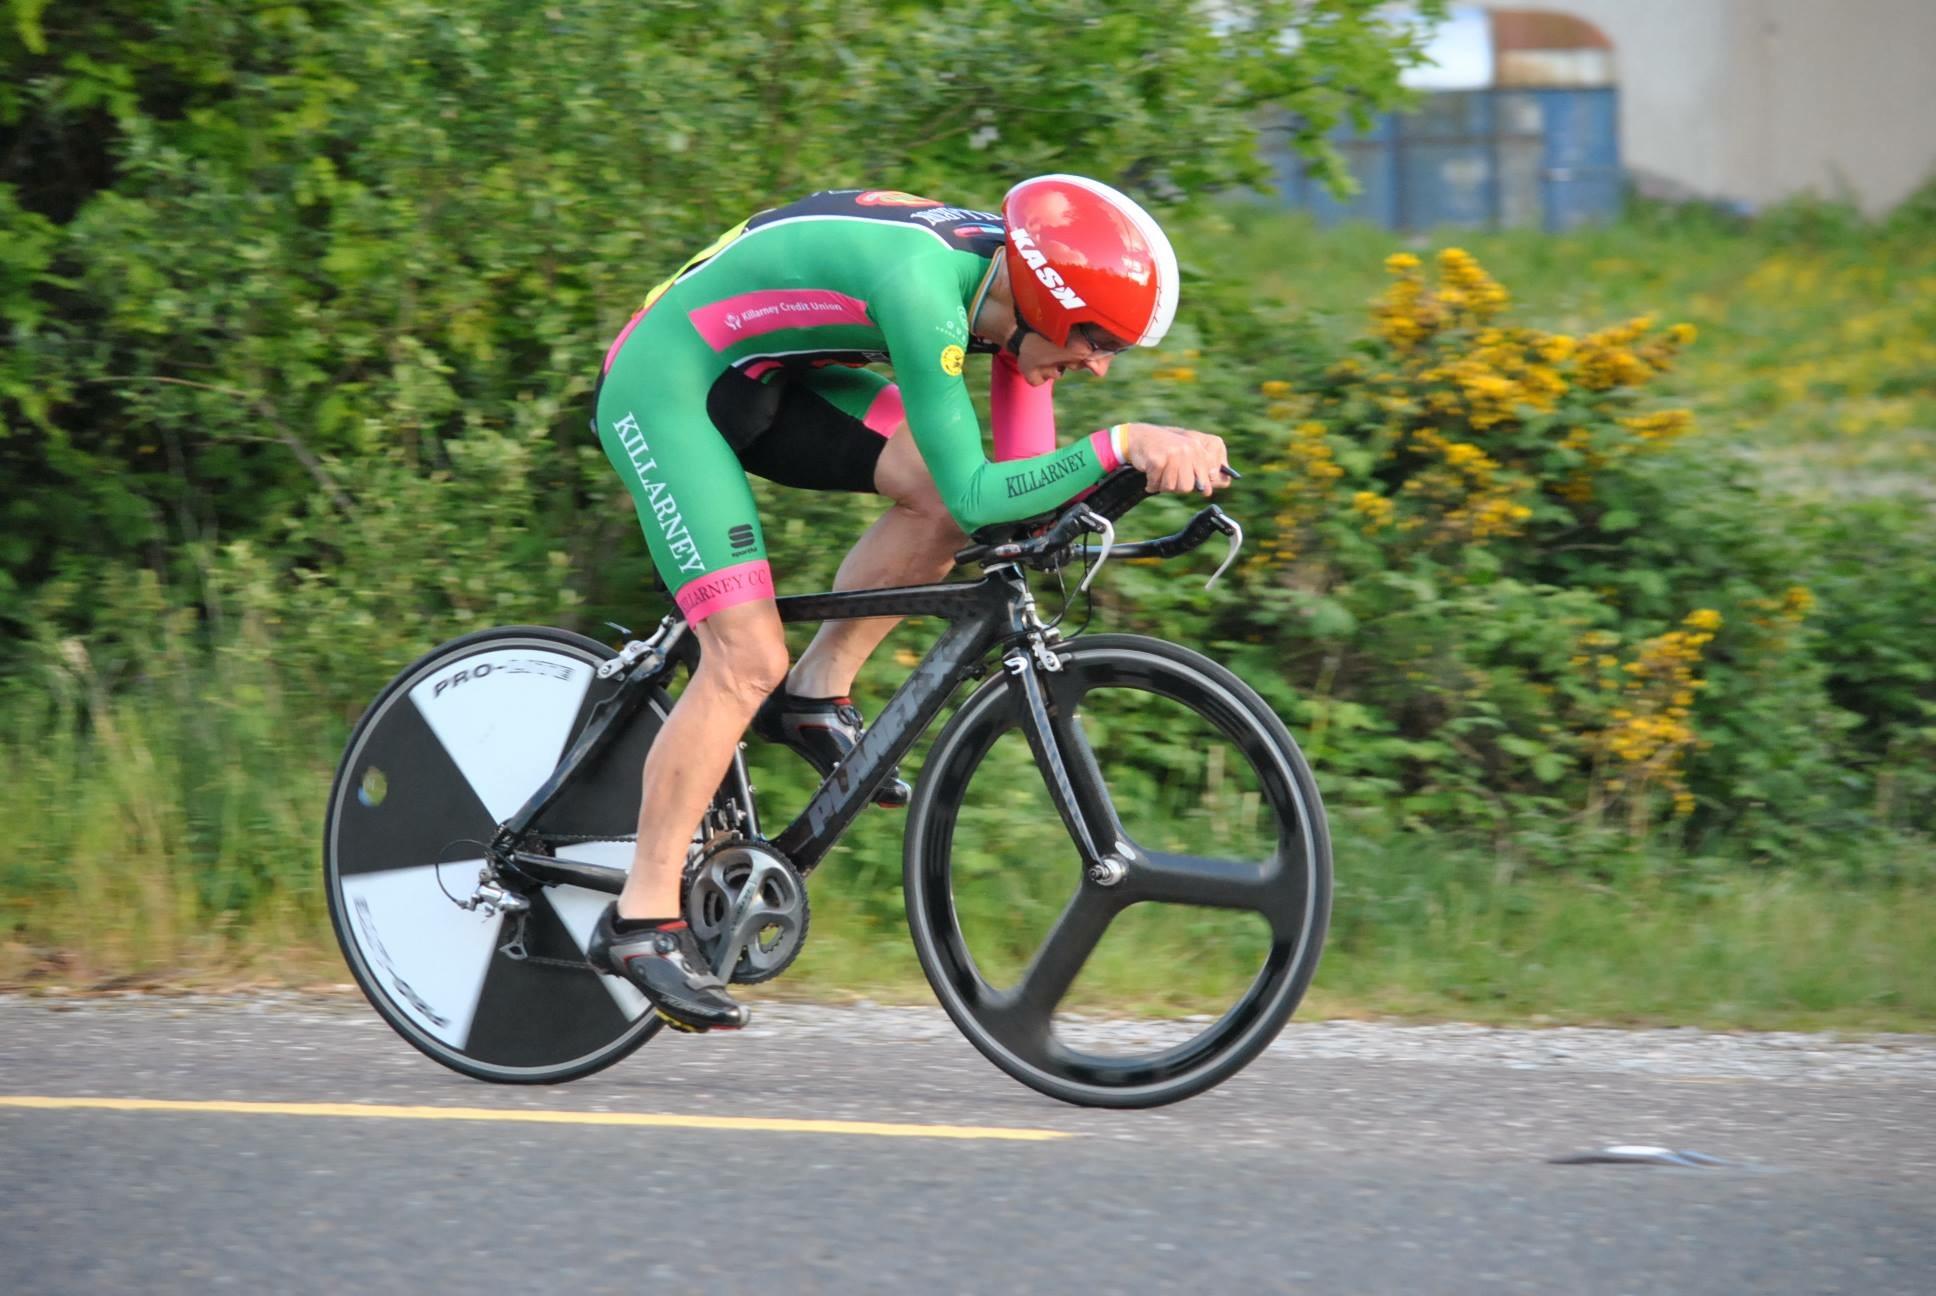 Munster TT Championships 2017, in kit of Killarney CC